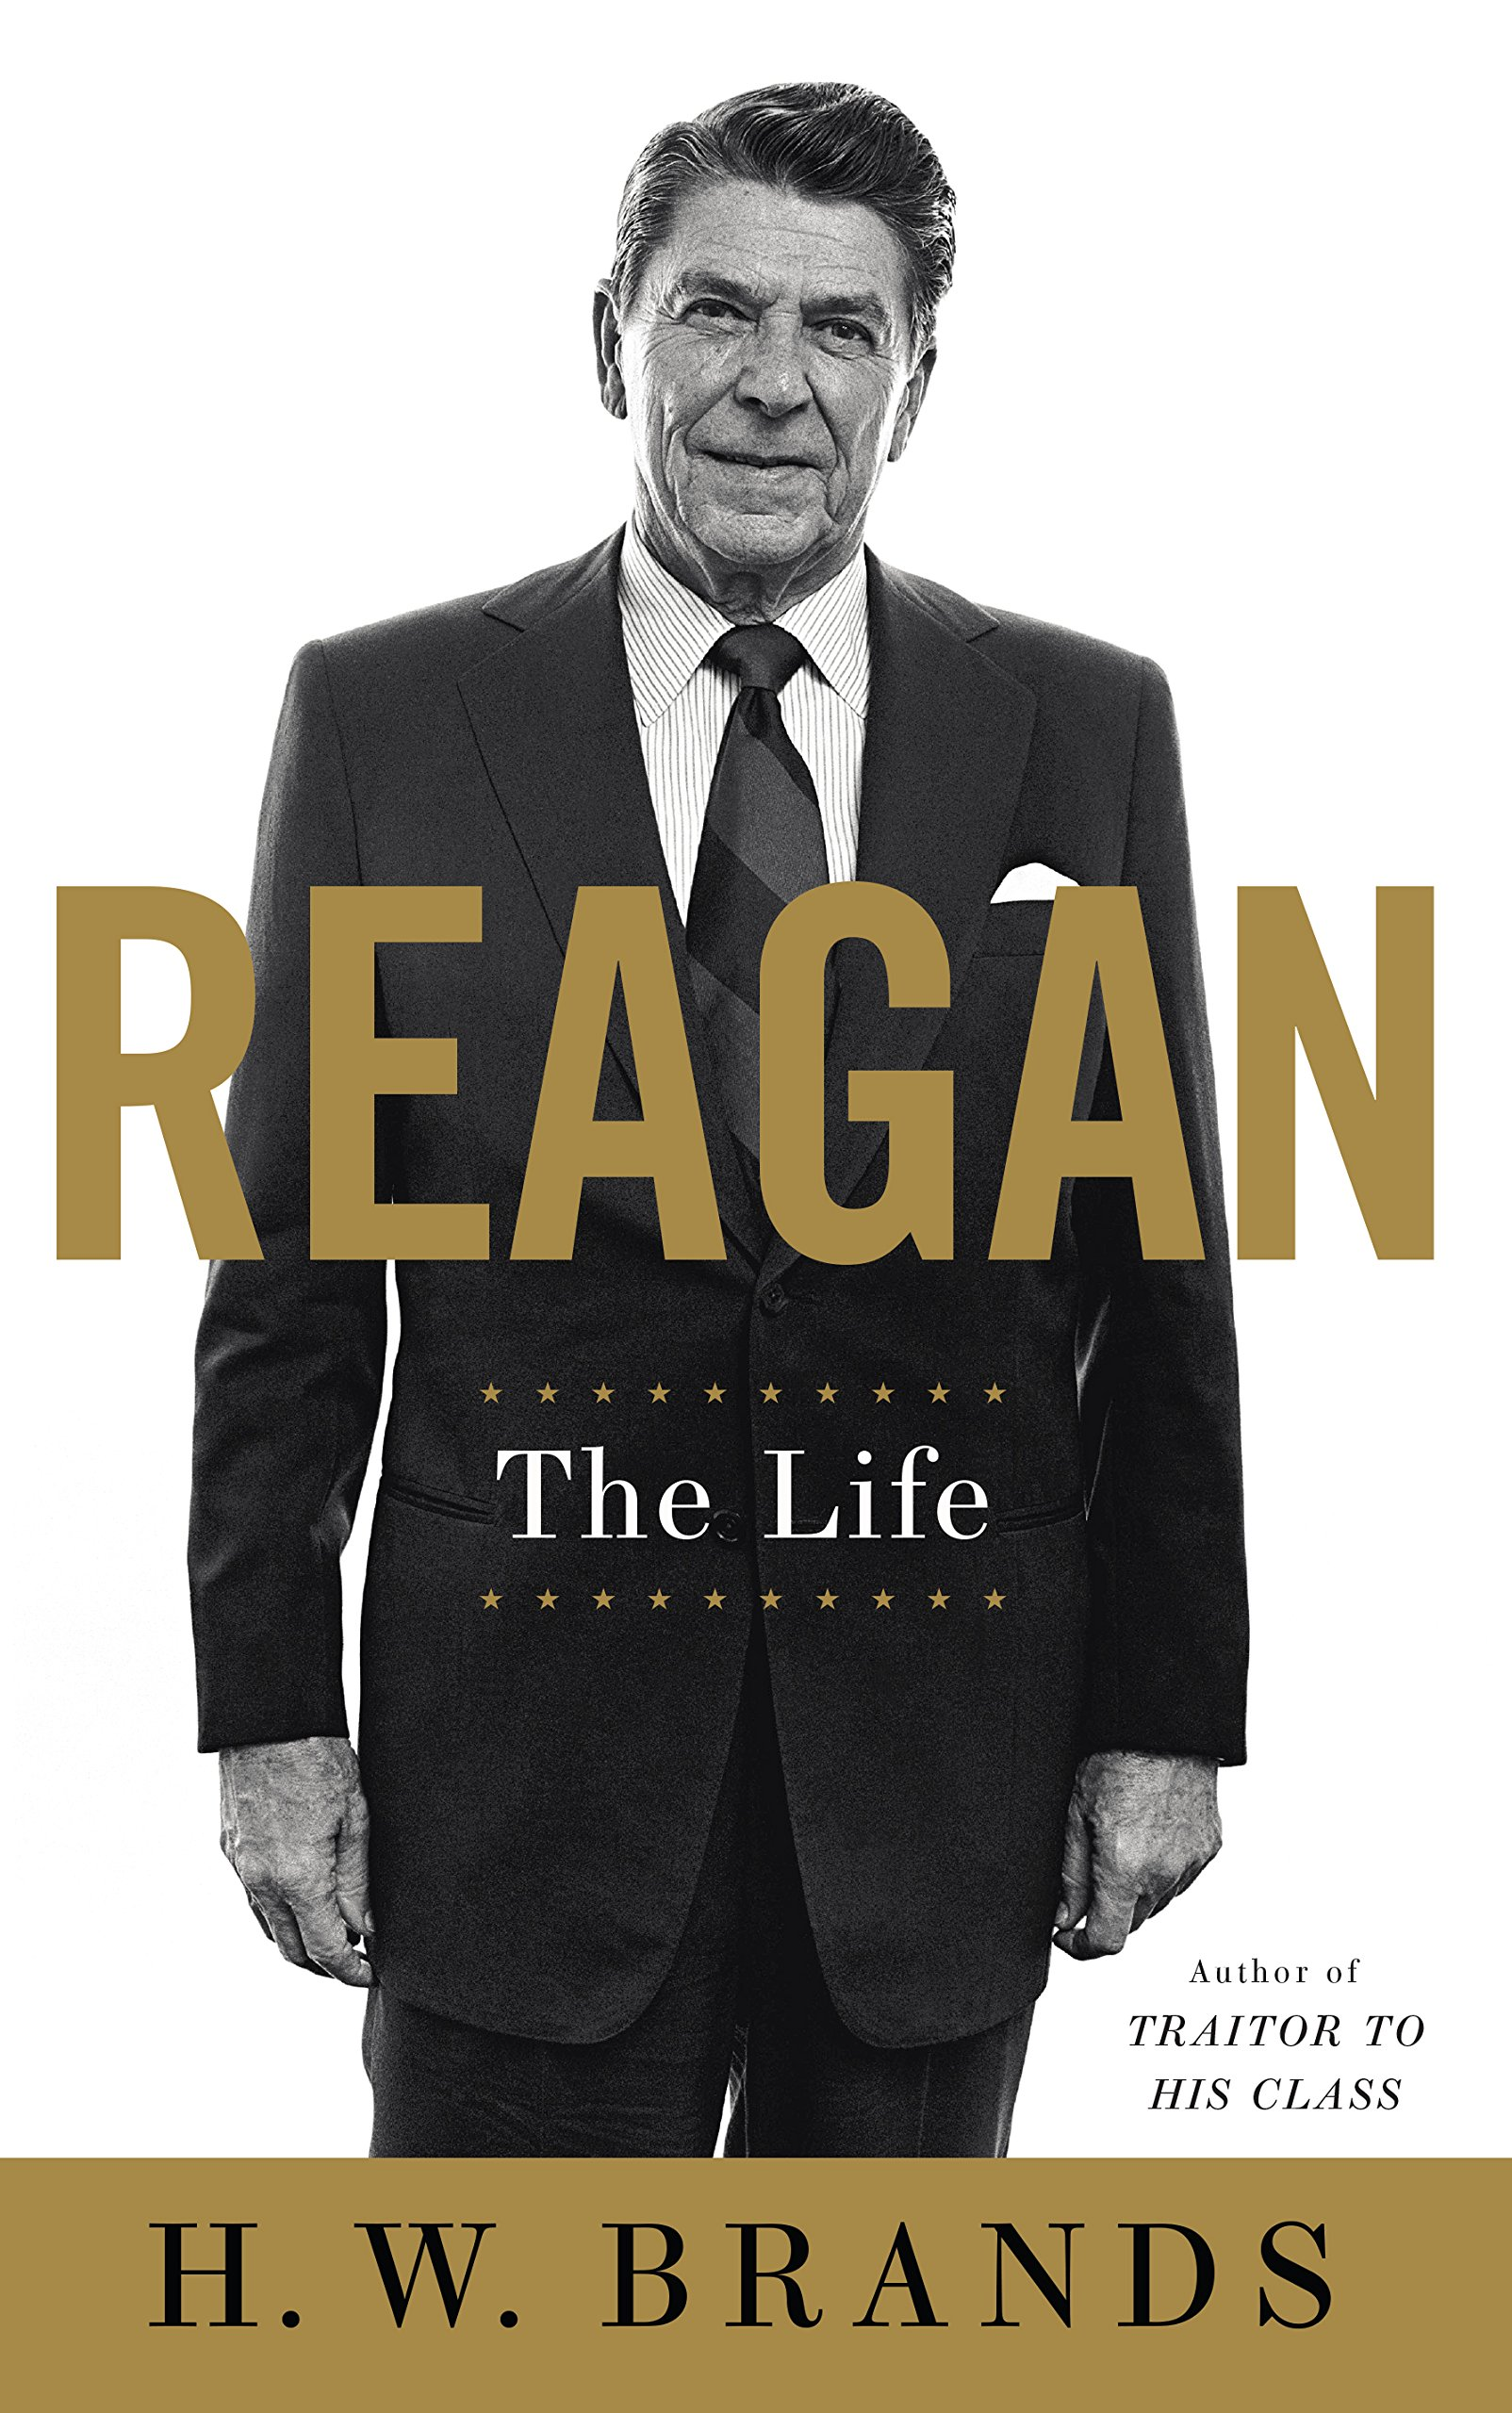 Reagan: The Life (Thorndike Press Large Print Biographies and Memoirs Series) ebook